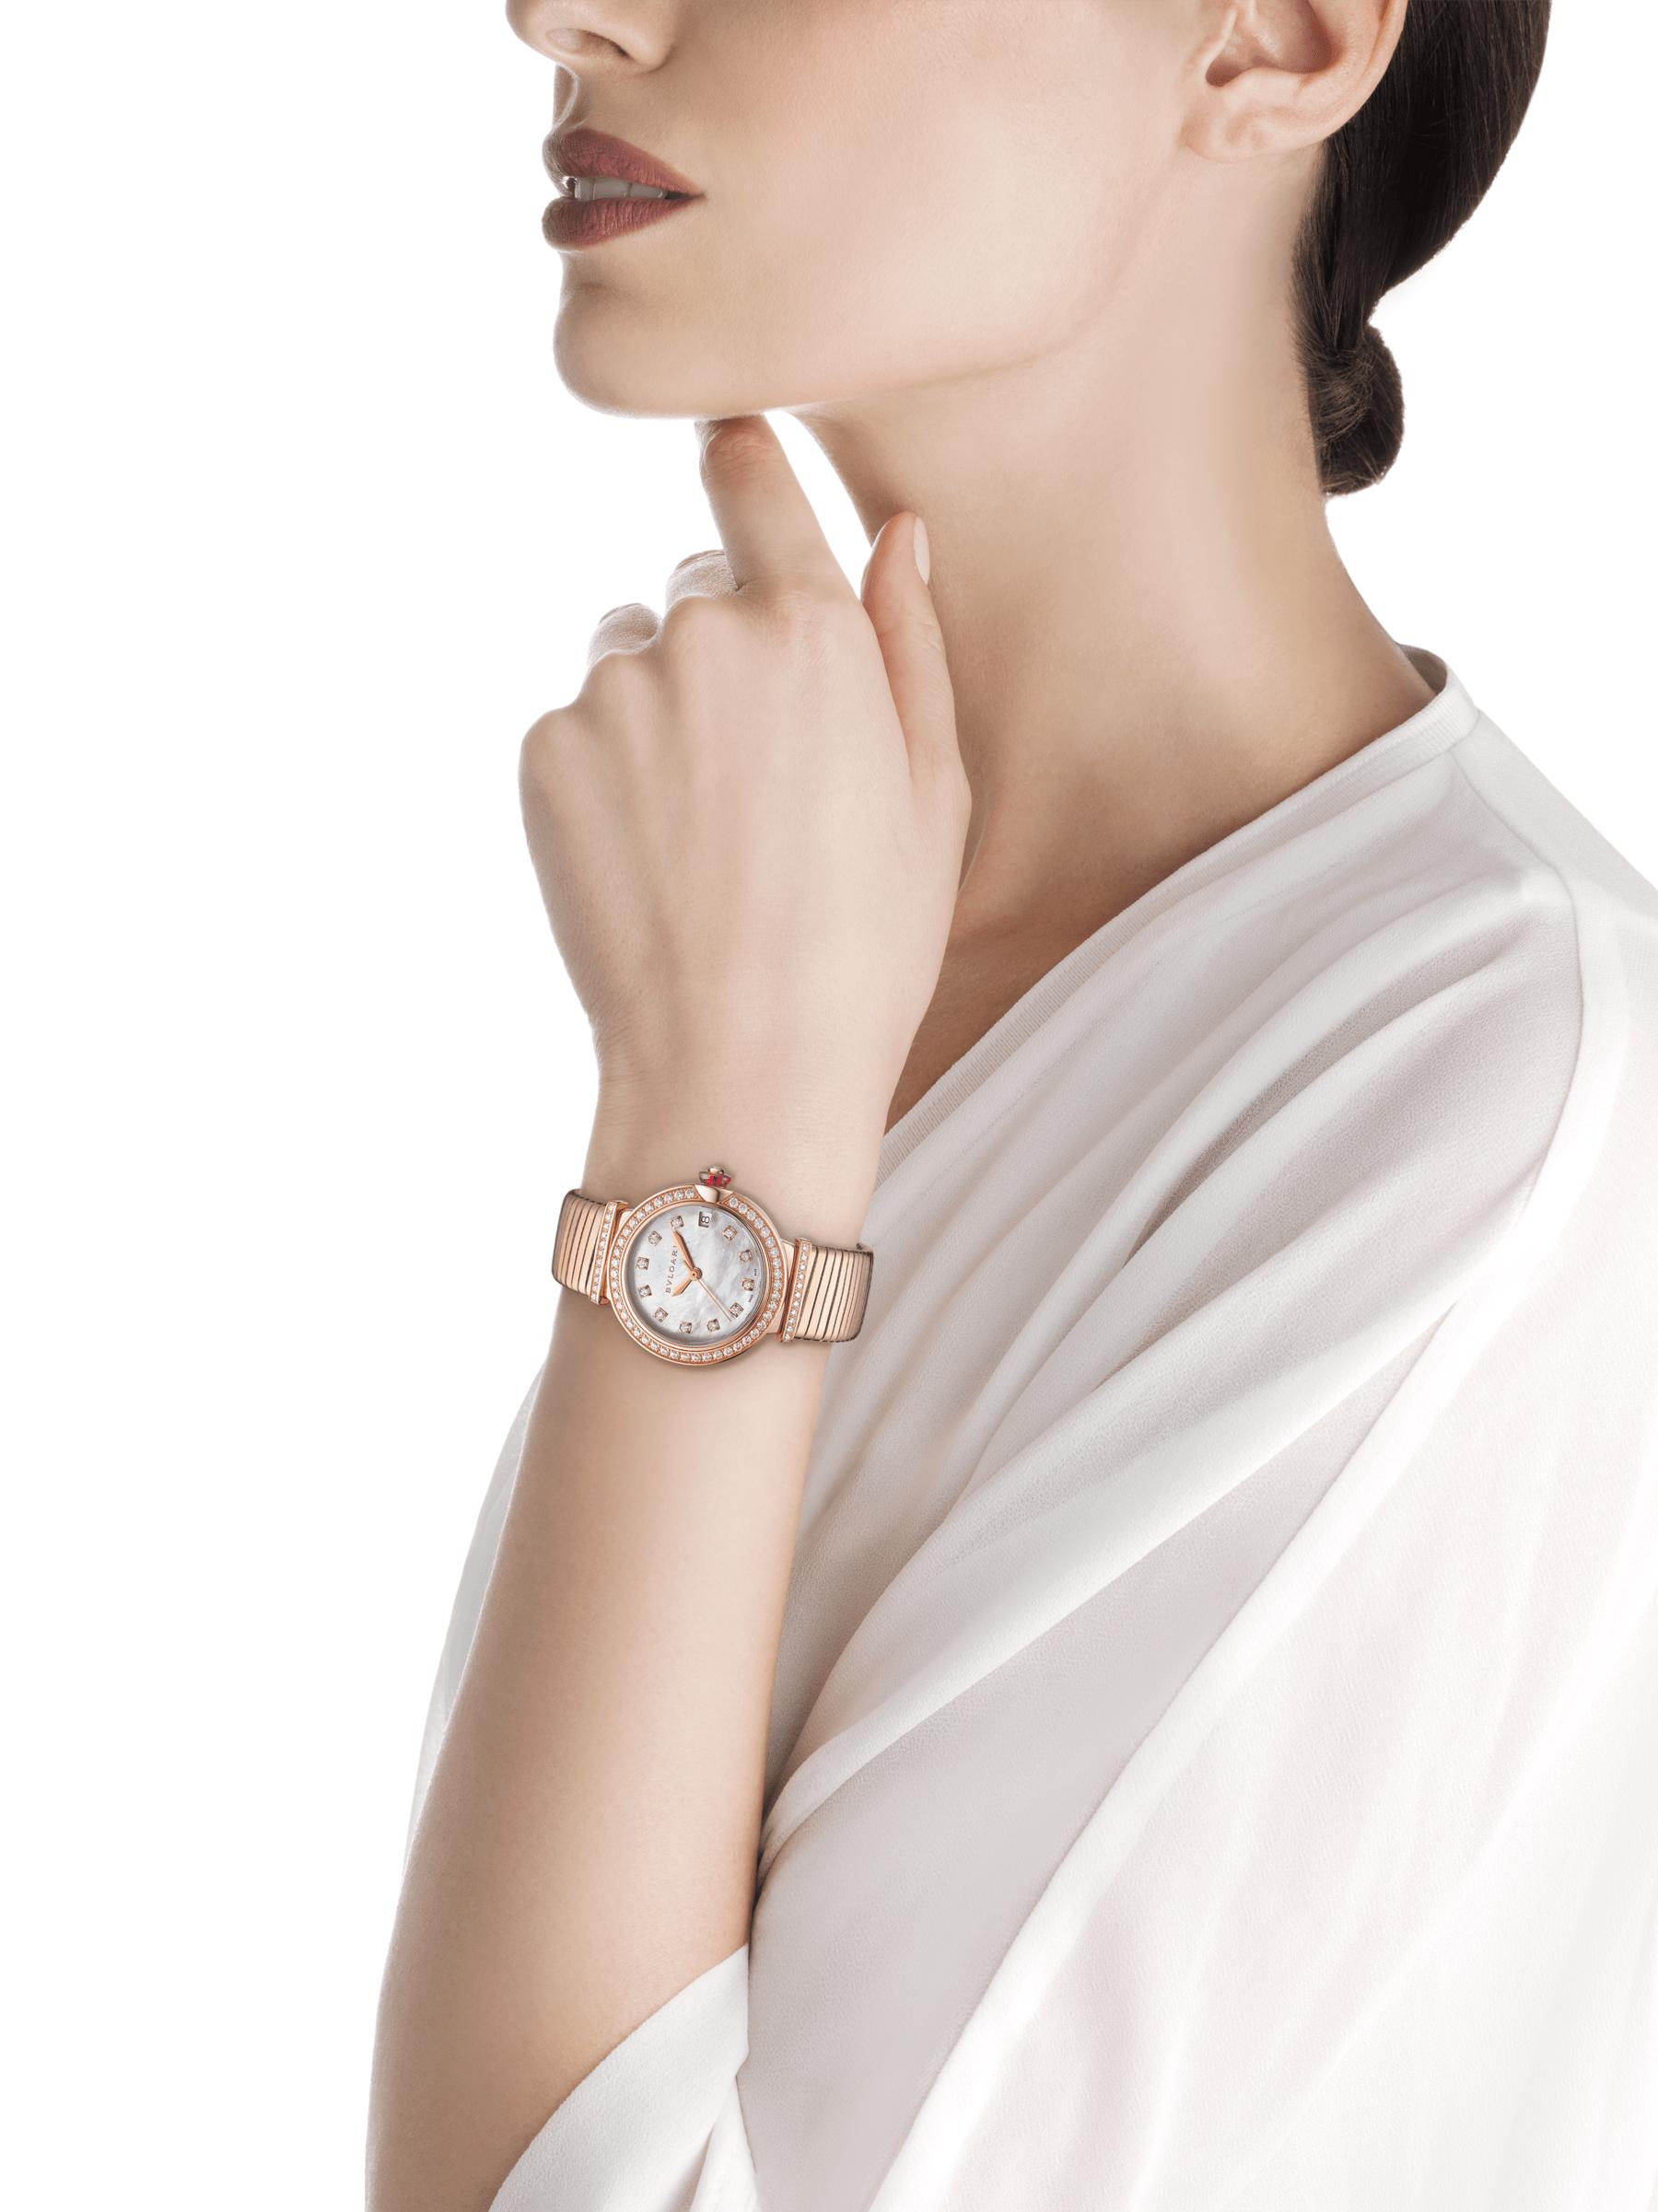 Reloj LVCEA Tubogas con caja en oro rosa de 18qt con diamantes engastados, esfera de madreperla blanca, diamantes engastados como índices y brazalete tubogas en oro rosa de 18qt. 103034 image 4